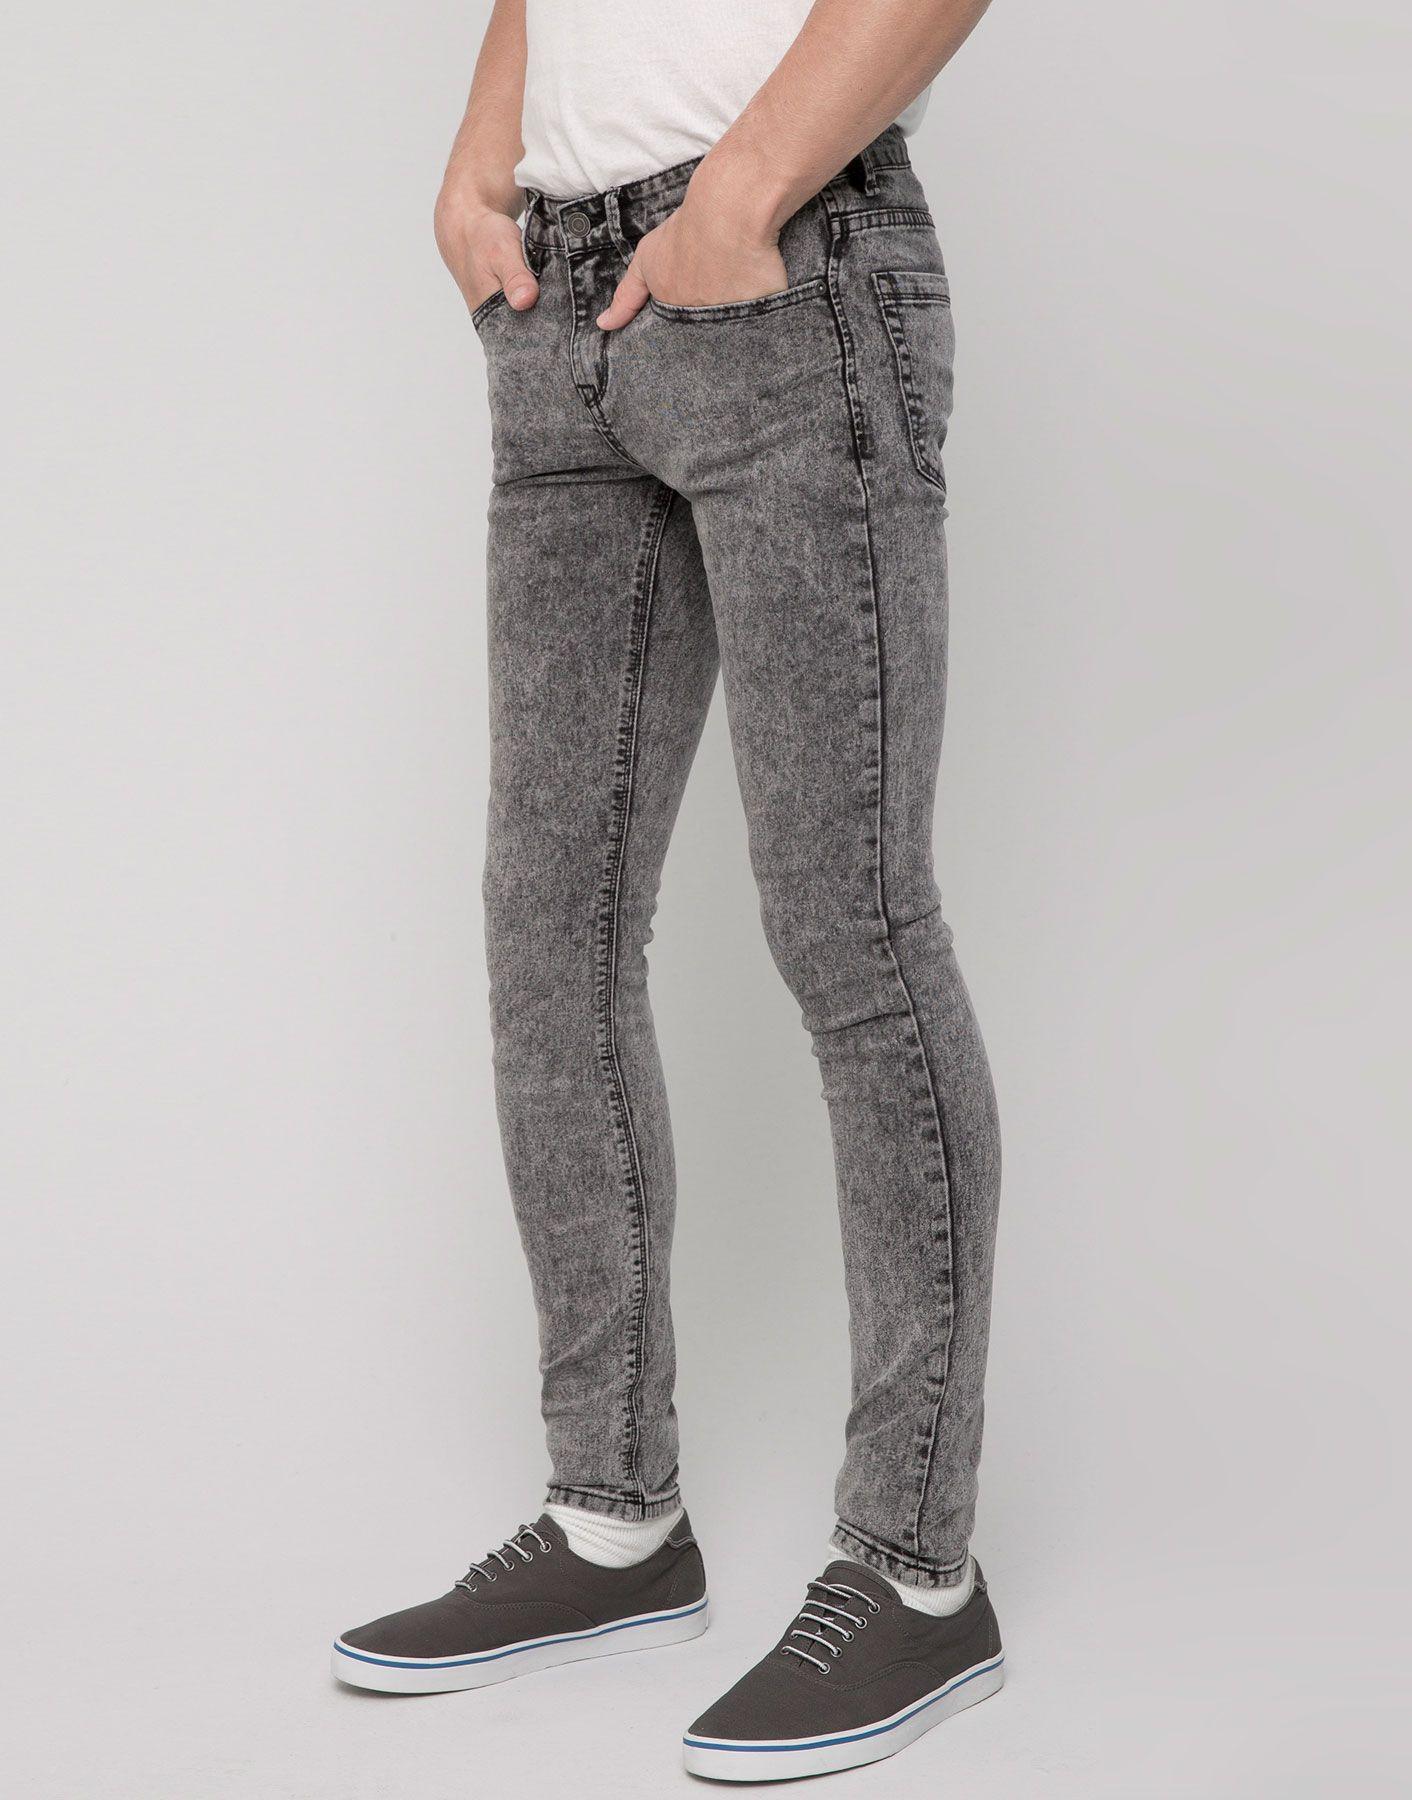 Super Skinny Jeans Jeans Man Pull Bear Ukraine Super Skinny Jeans Grey Jeans Men Mens Jeans